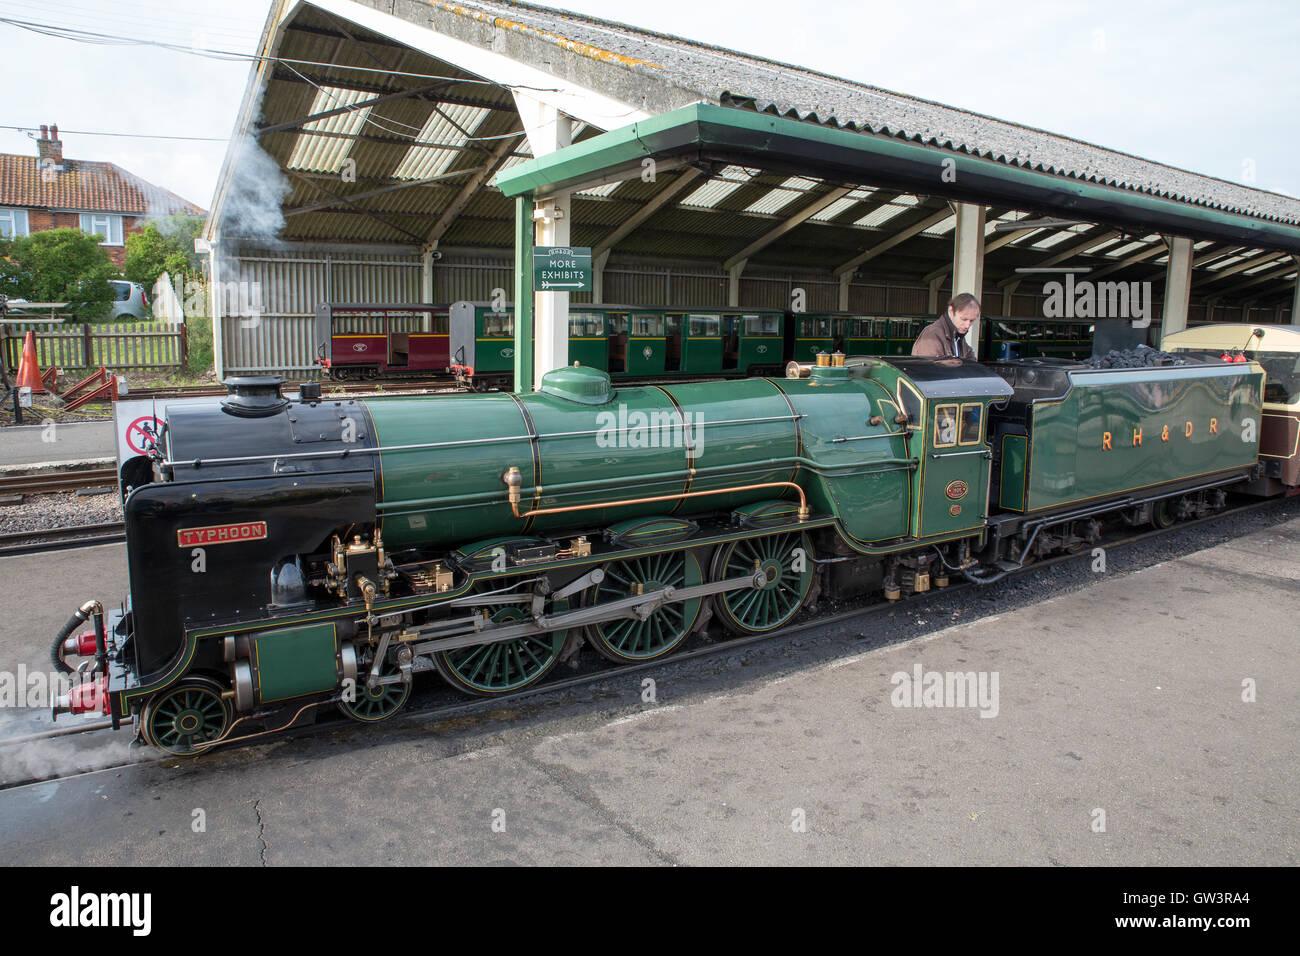 The Romney, Hythe & Dymchurch Railway (RH&DR) is a 15 in (381 mm) gauge light railway in Kent, England, - Stock Image